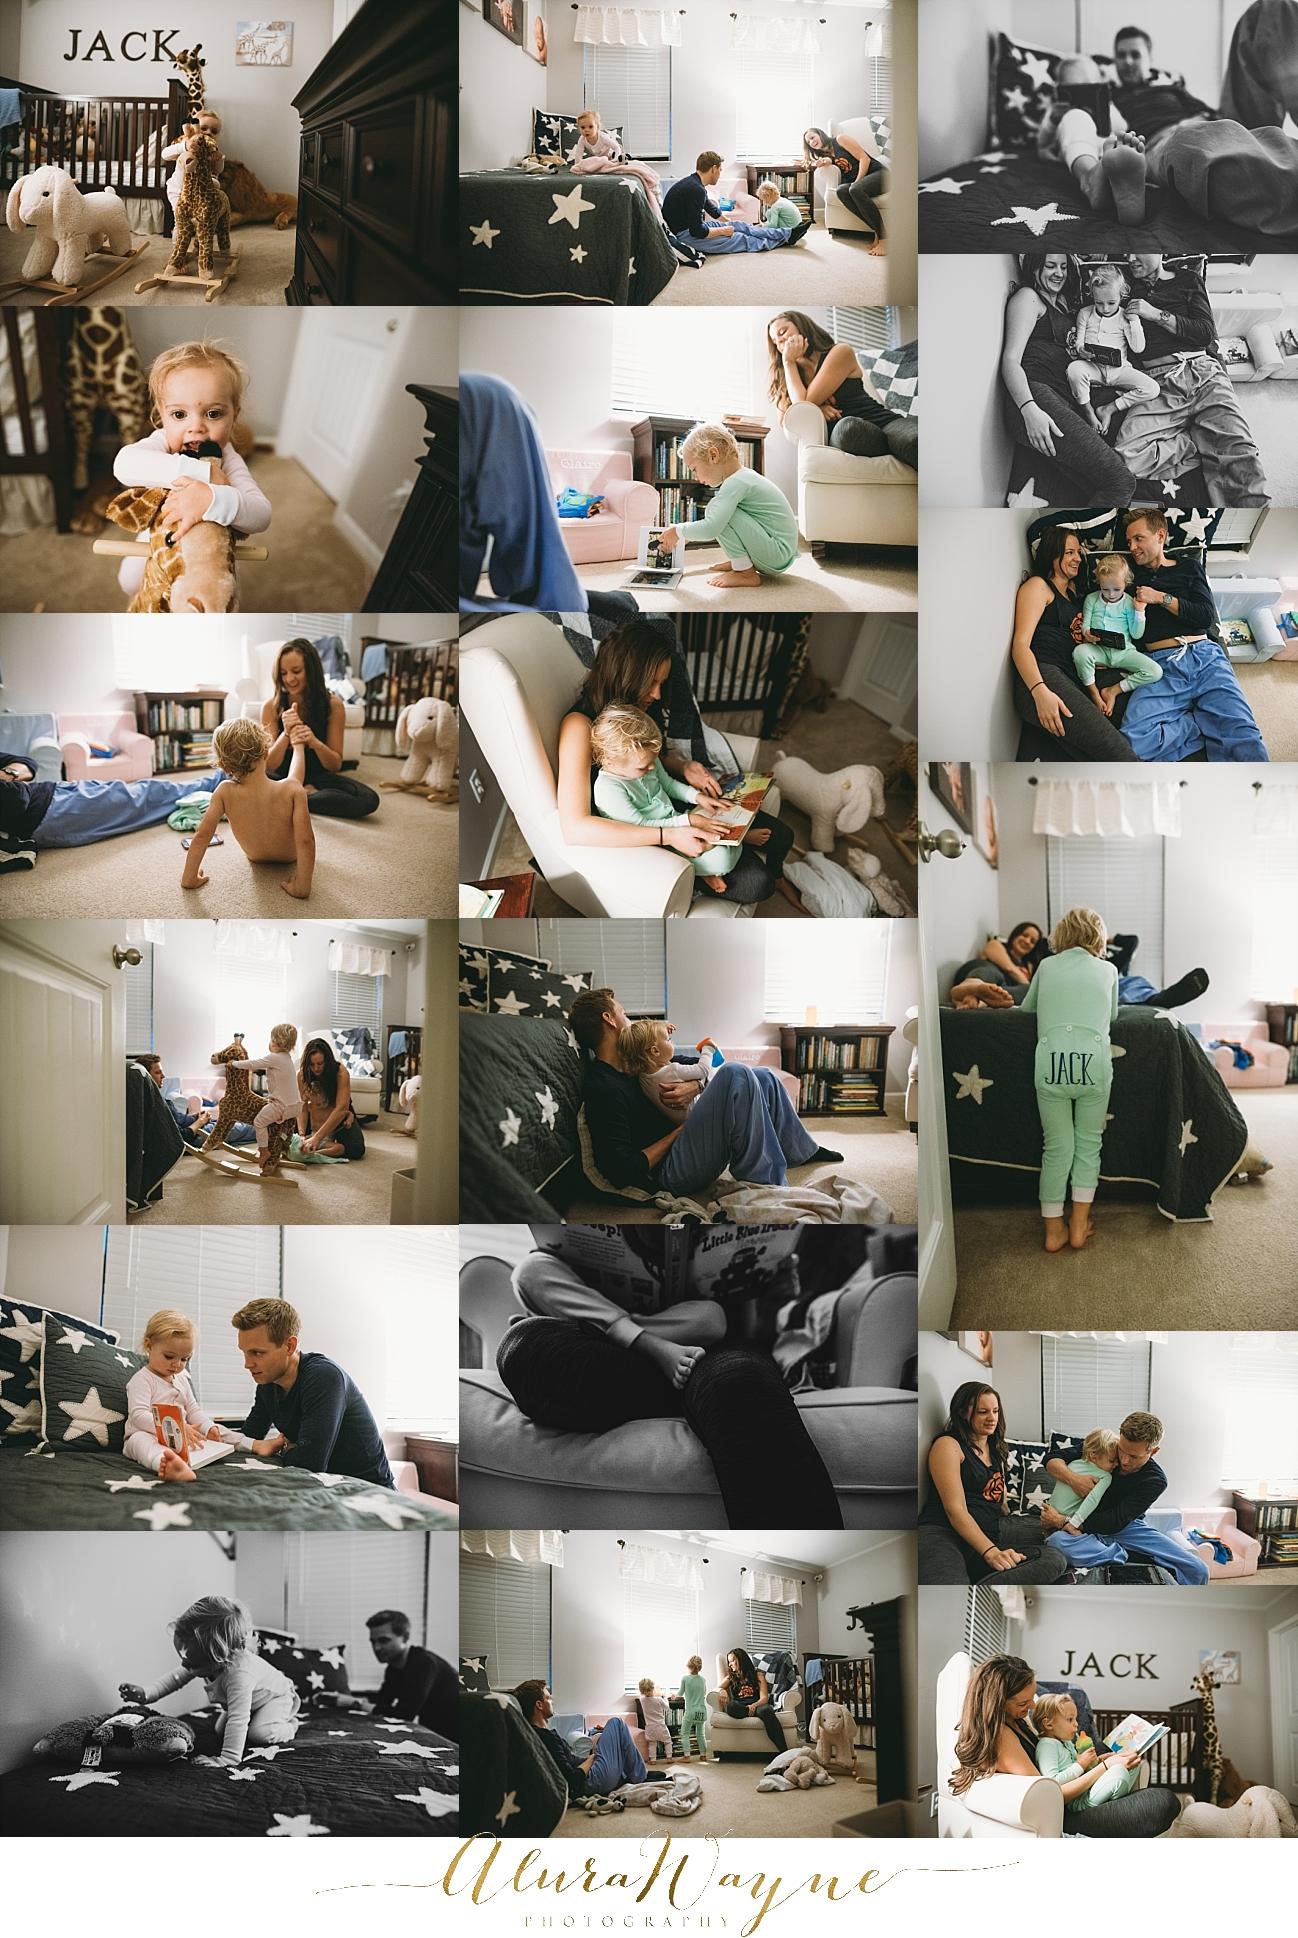 nashville documentary photographers | alurawayne photography